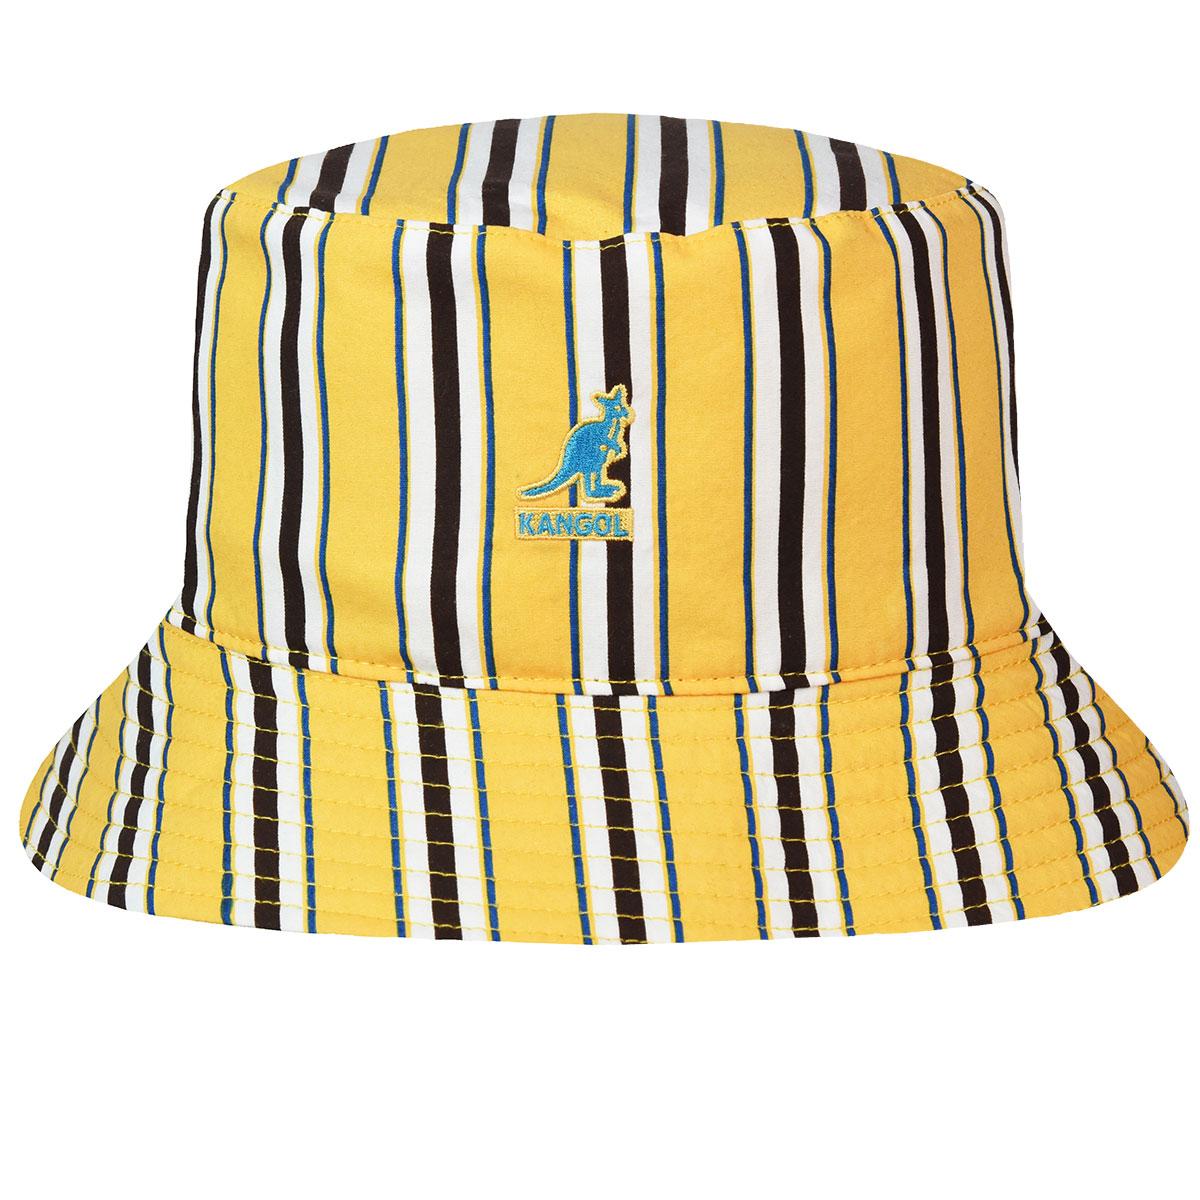 80s Hats, Caps, Visors, Buckets | Women and Men Double Pattern Bucket $45.00 AT vintagedancer.com